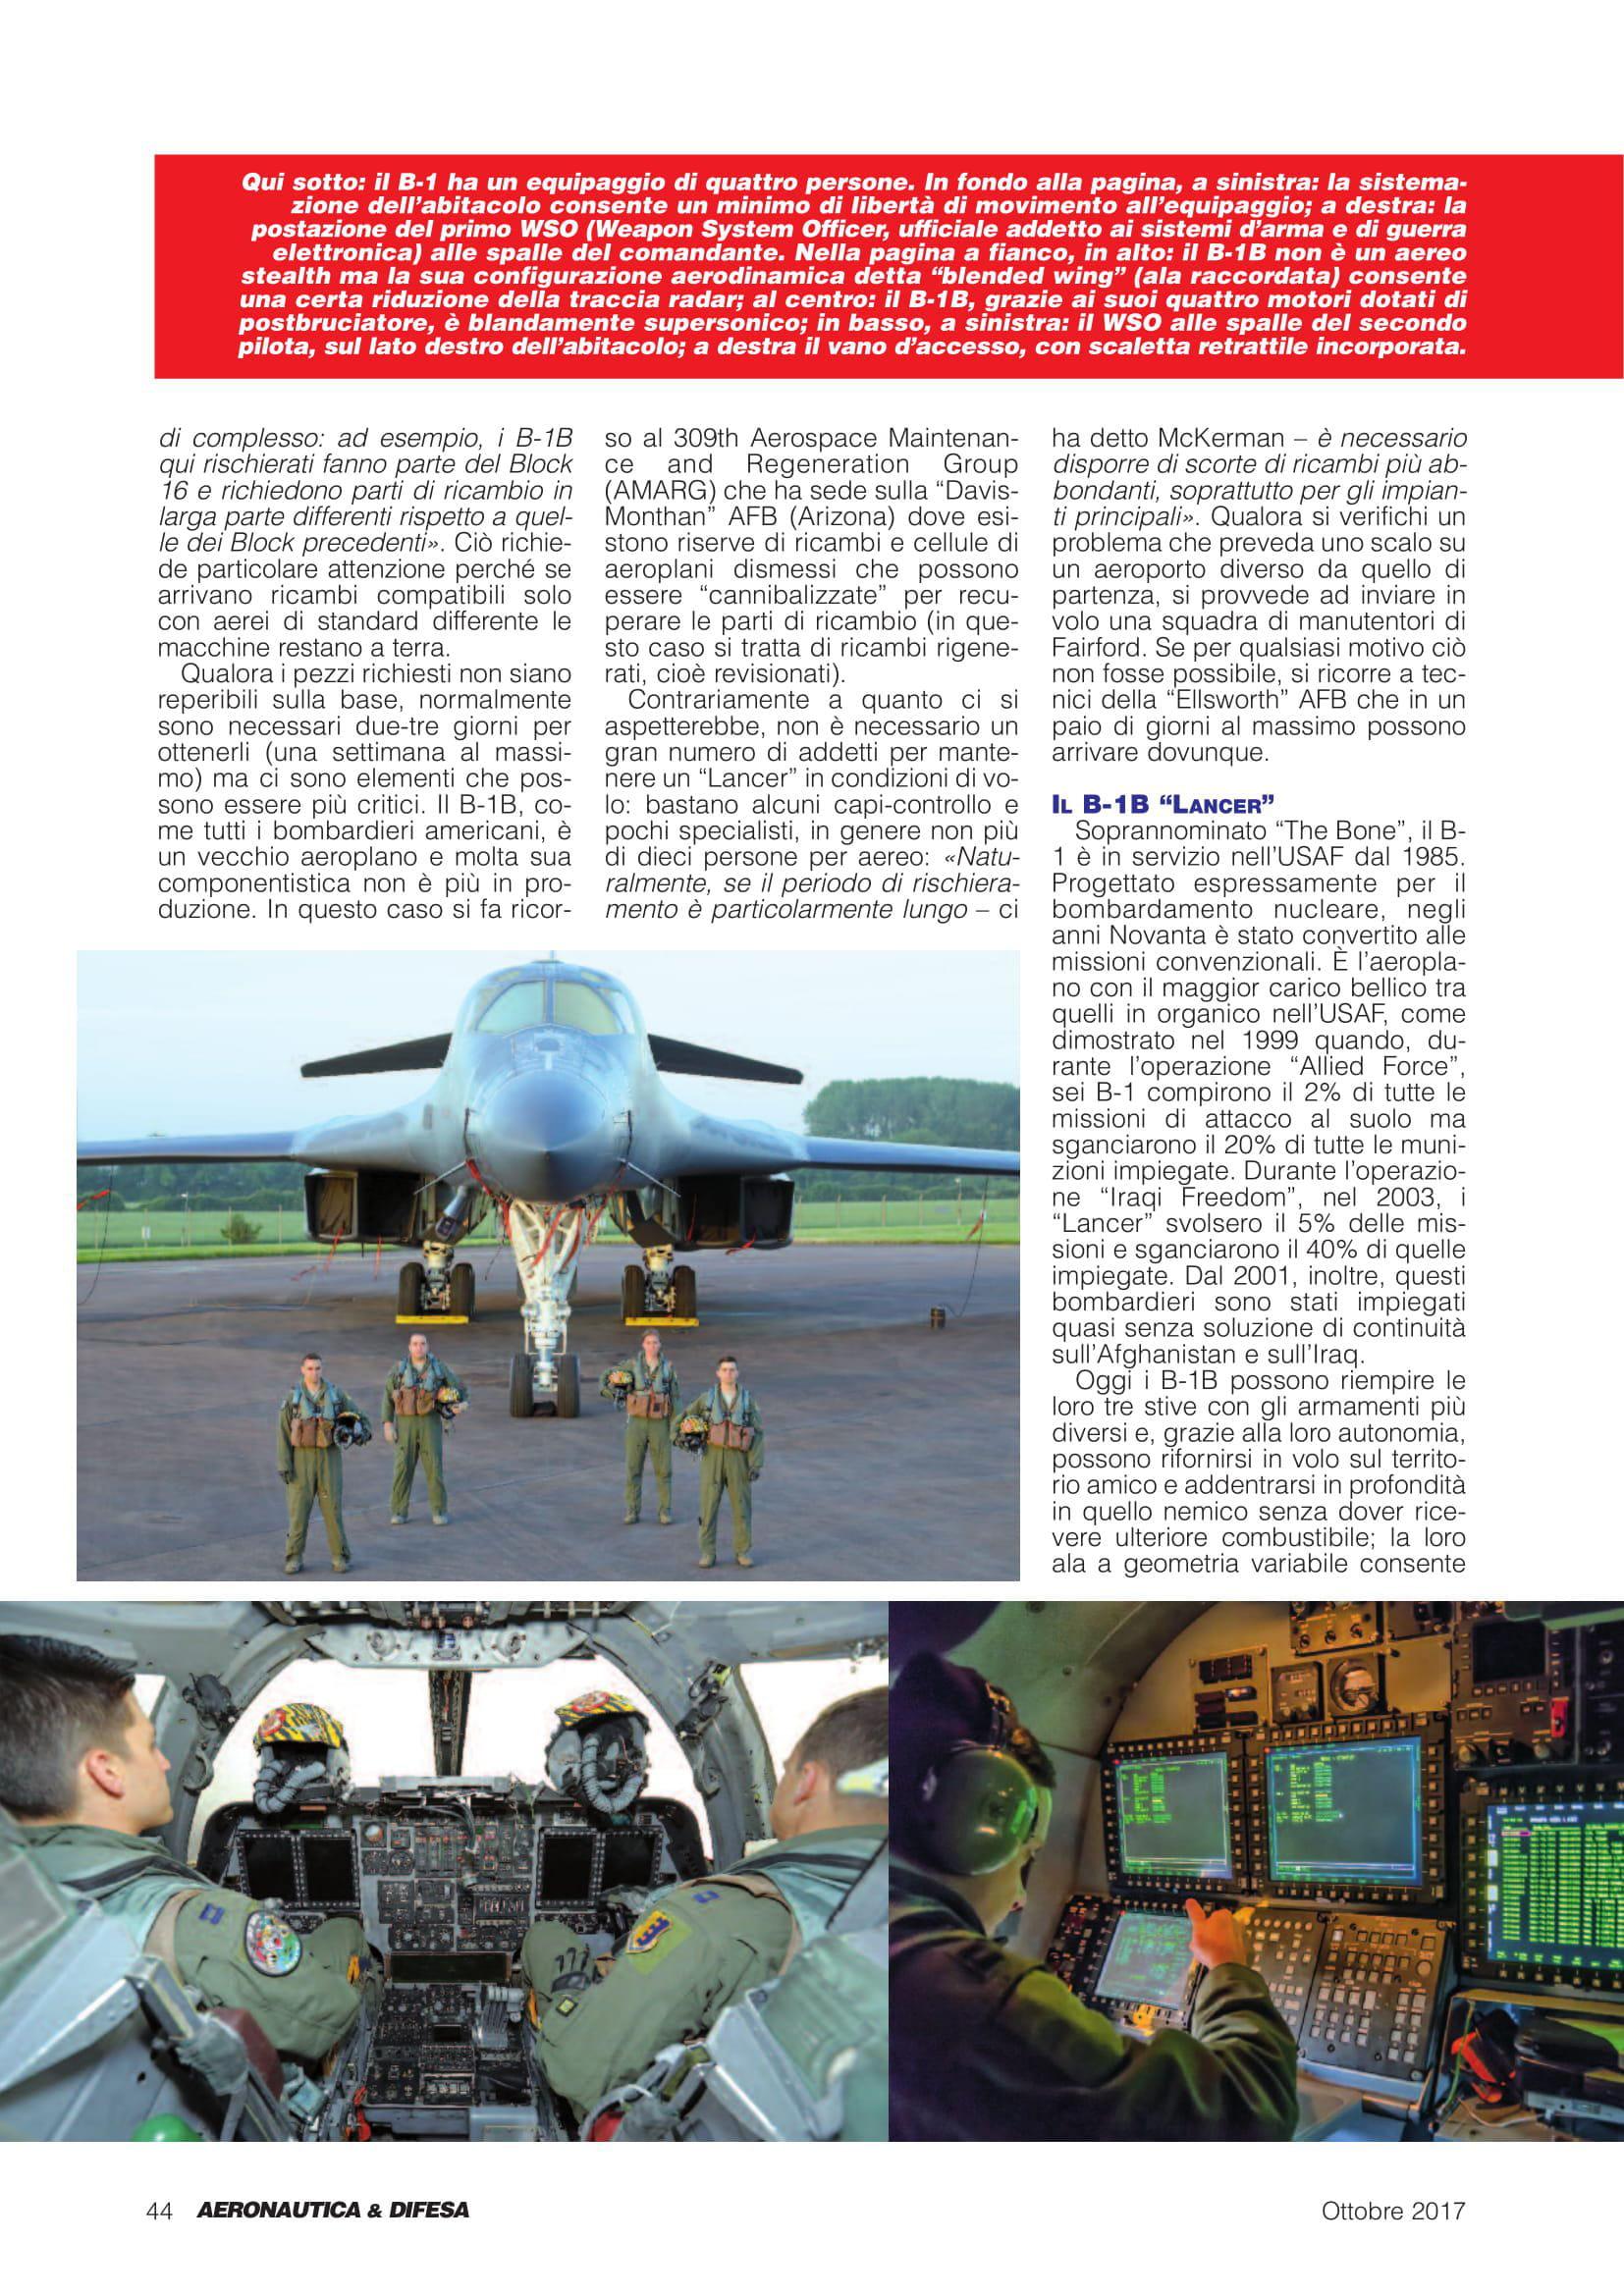 Aeronautica & Difesa (Italy)_Baltops & Saber Strike 2017-4